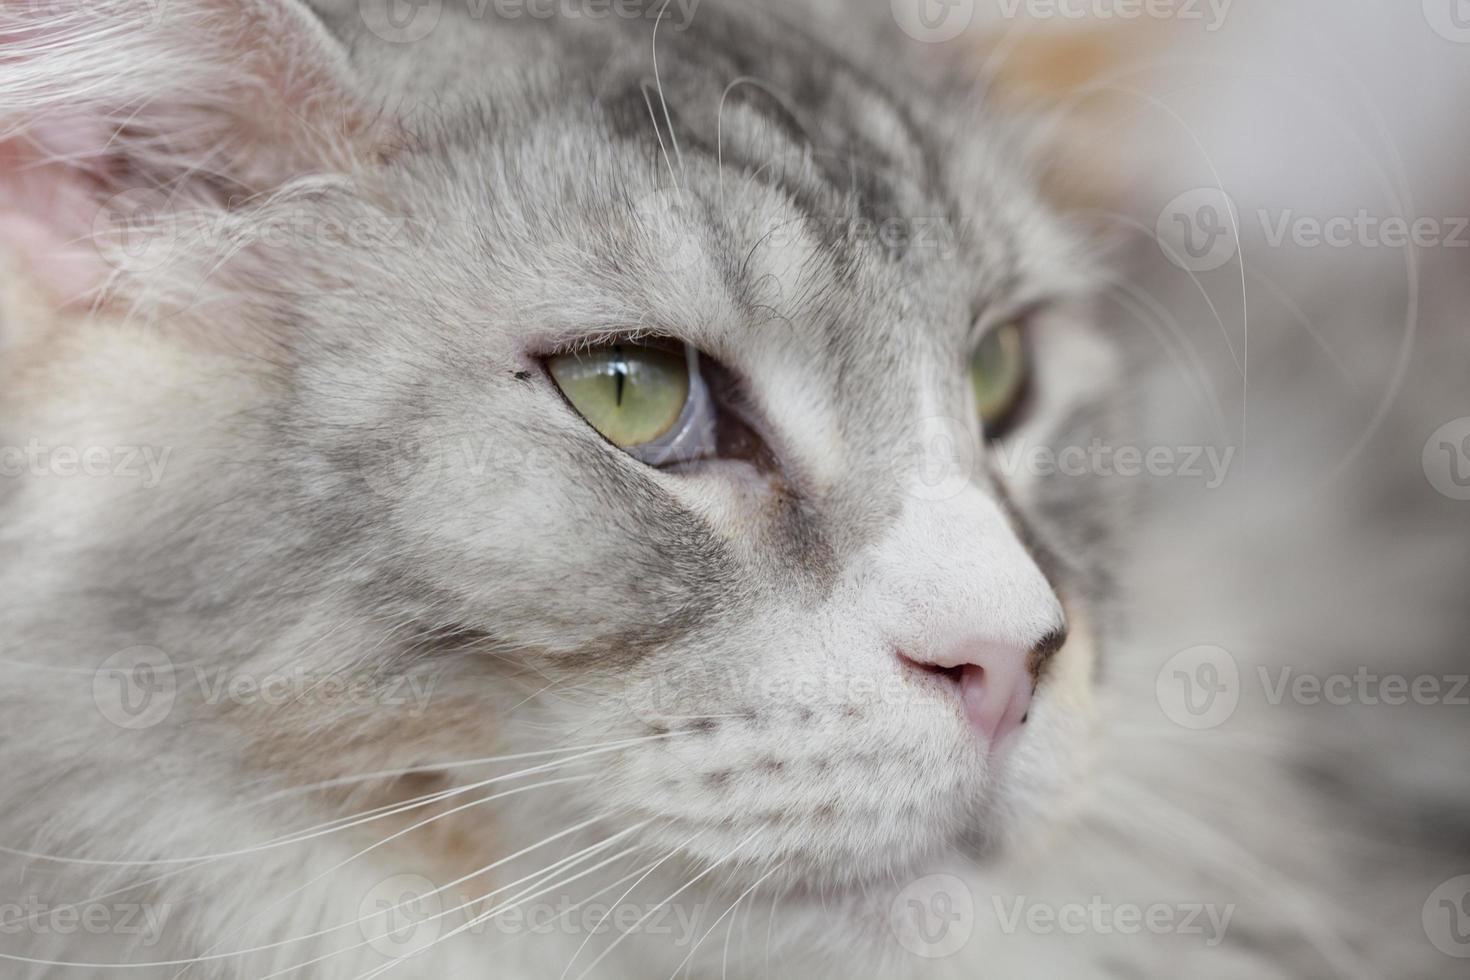 cabeza de gato de cerca foto